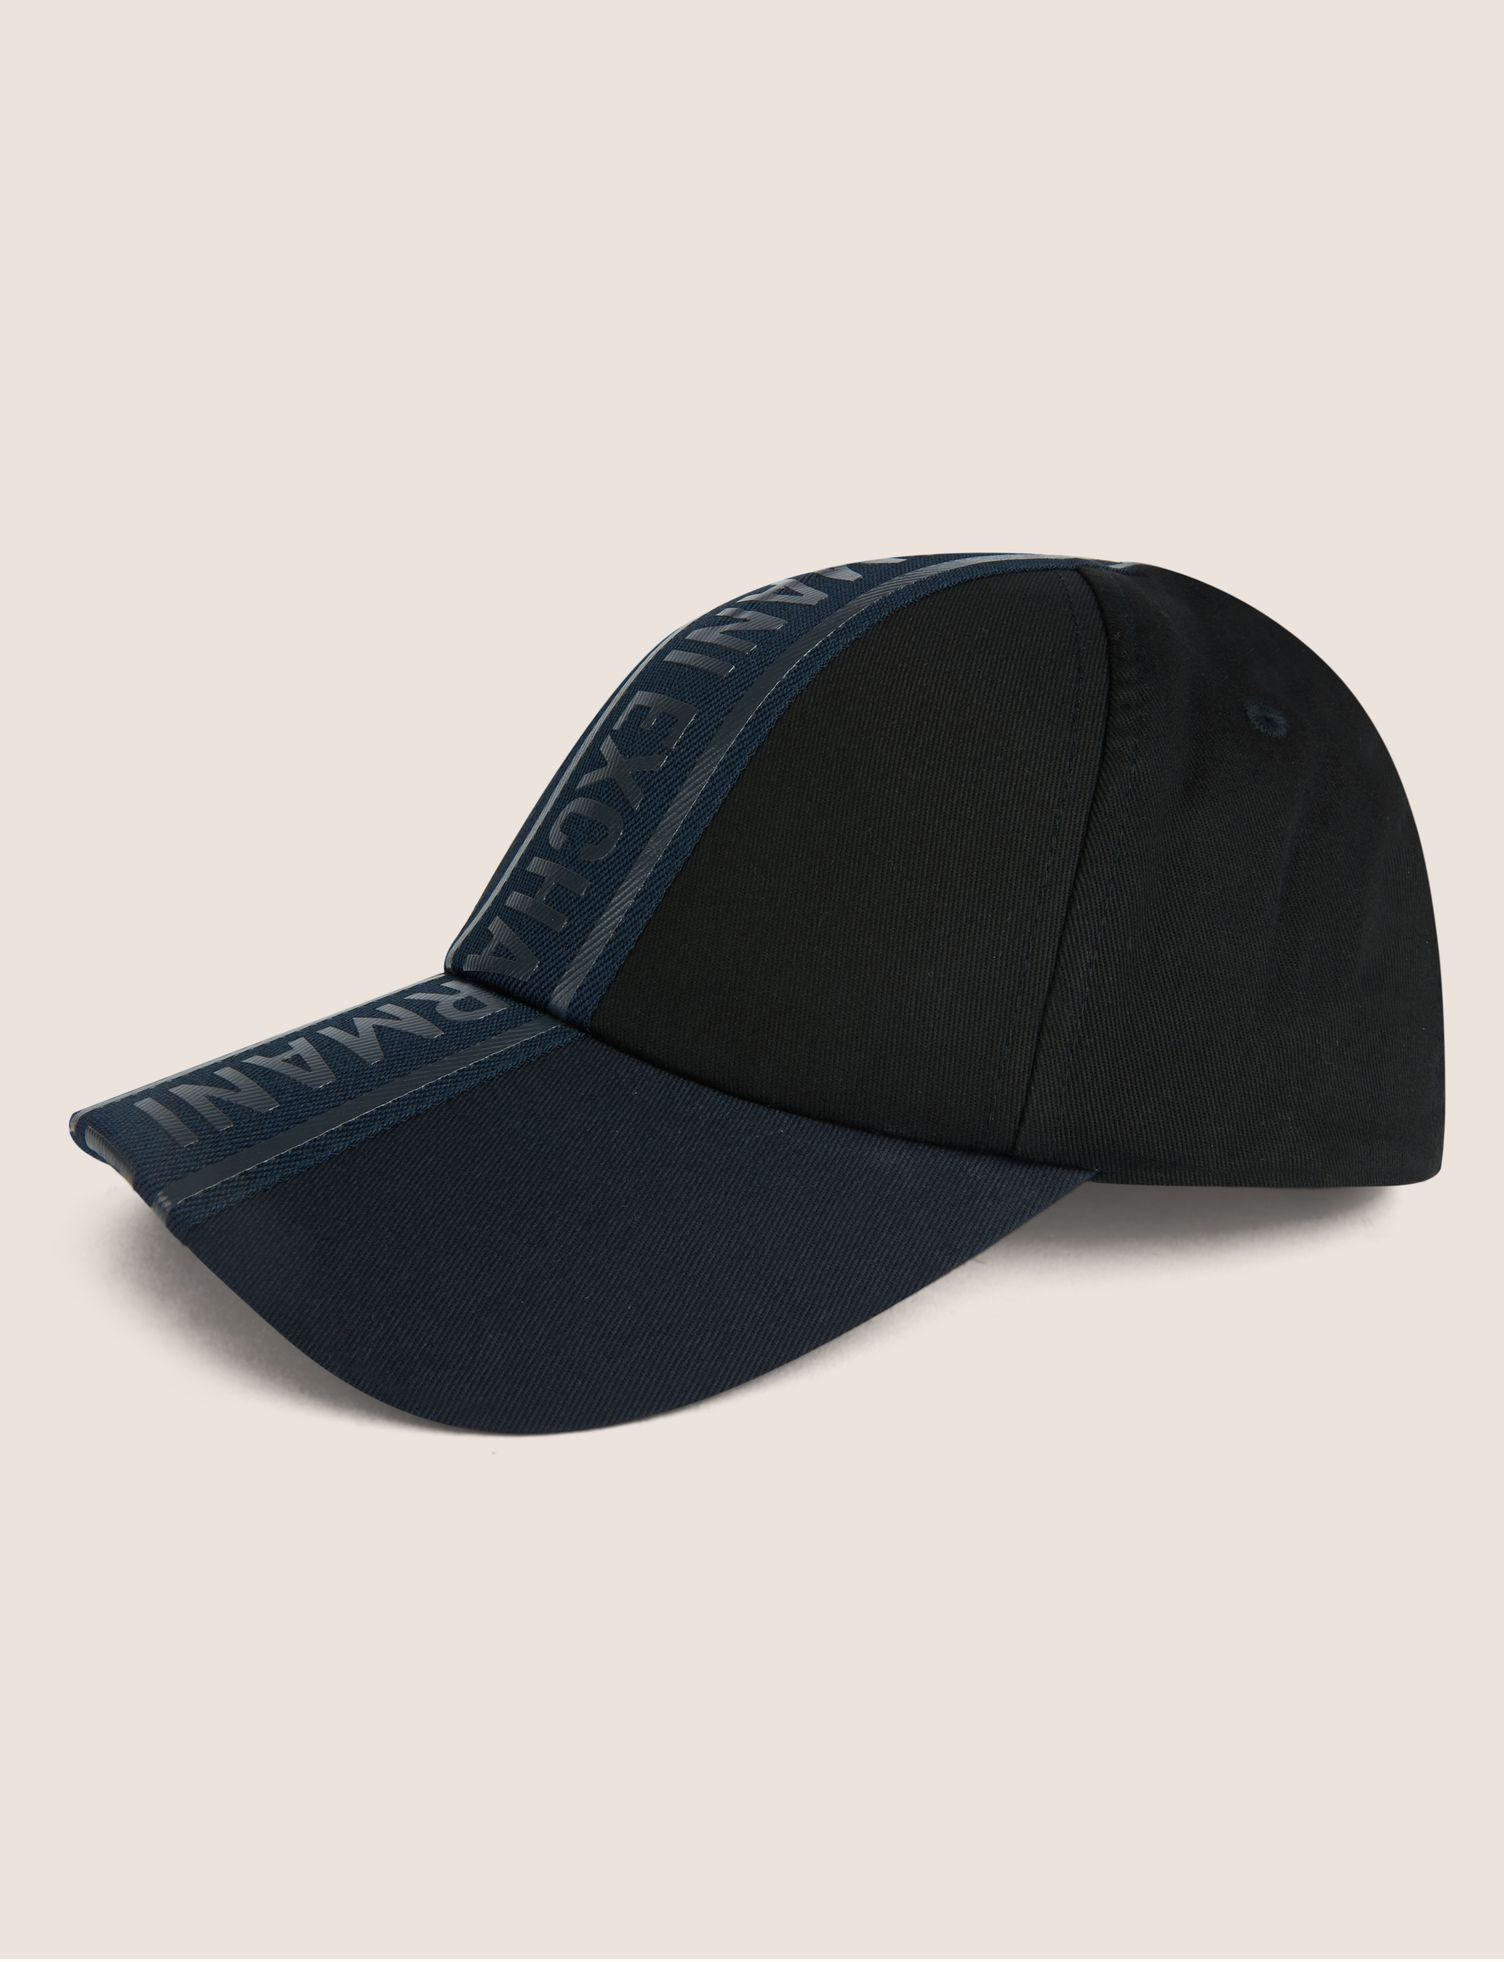 Lyst - Armani Exchange High-shine Logo Tape Hat in Black for Men 52b21c90f19e